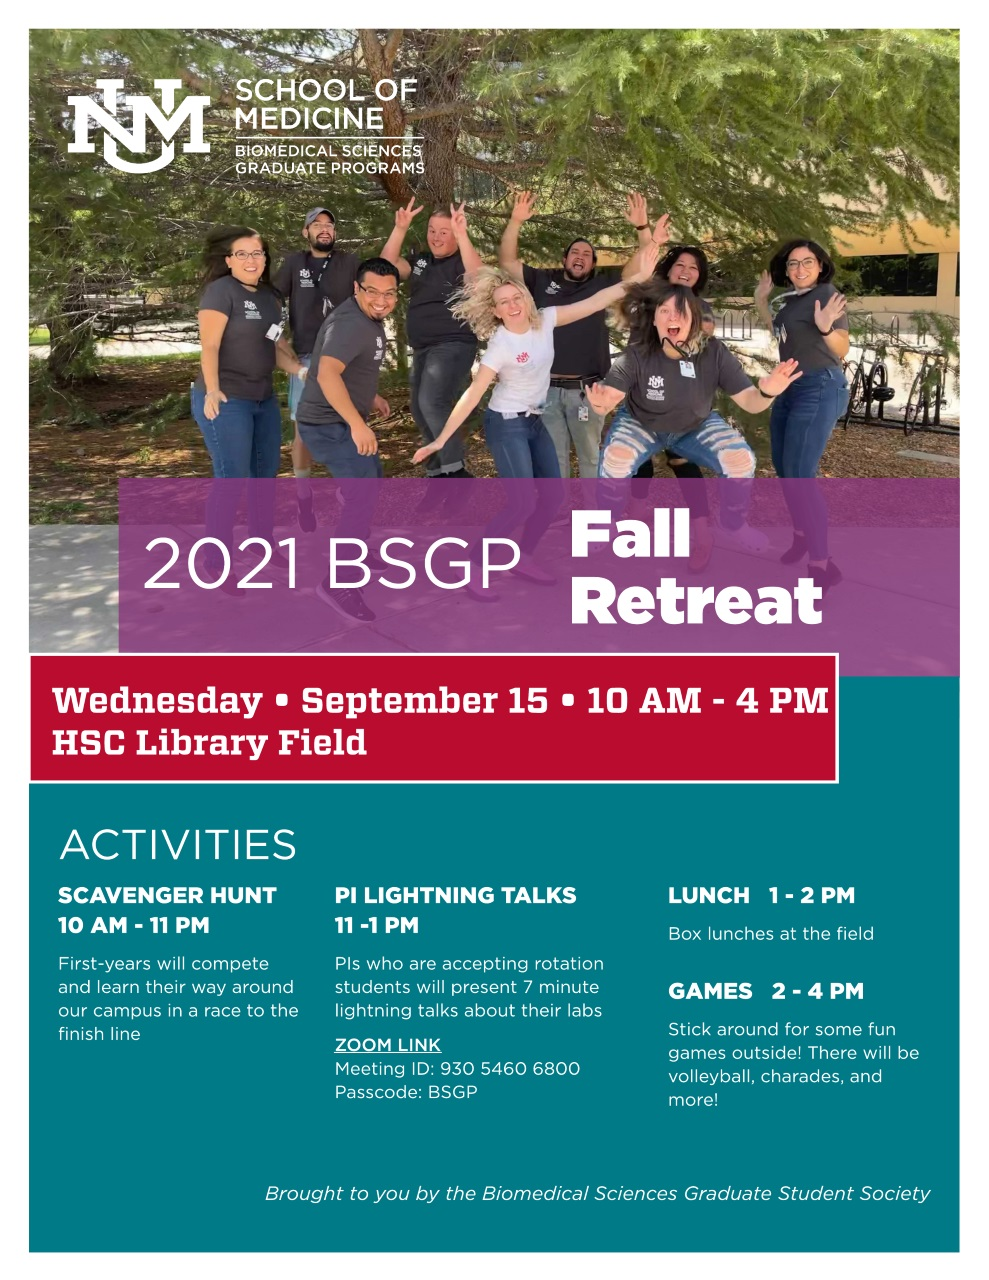 BSGP Fall Retreat 09/13